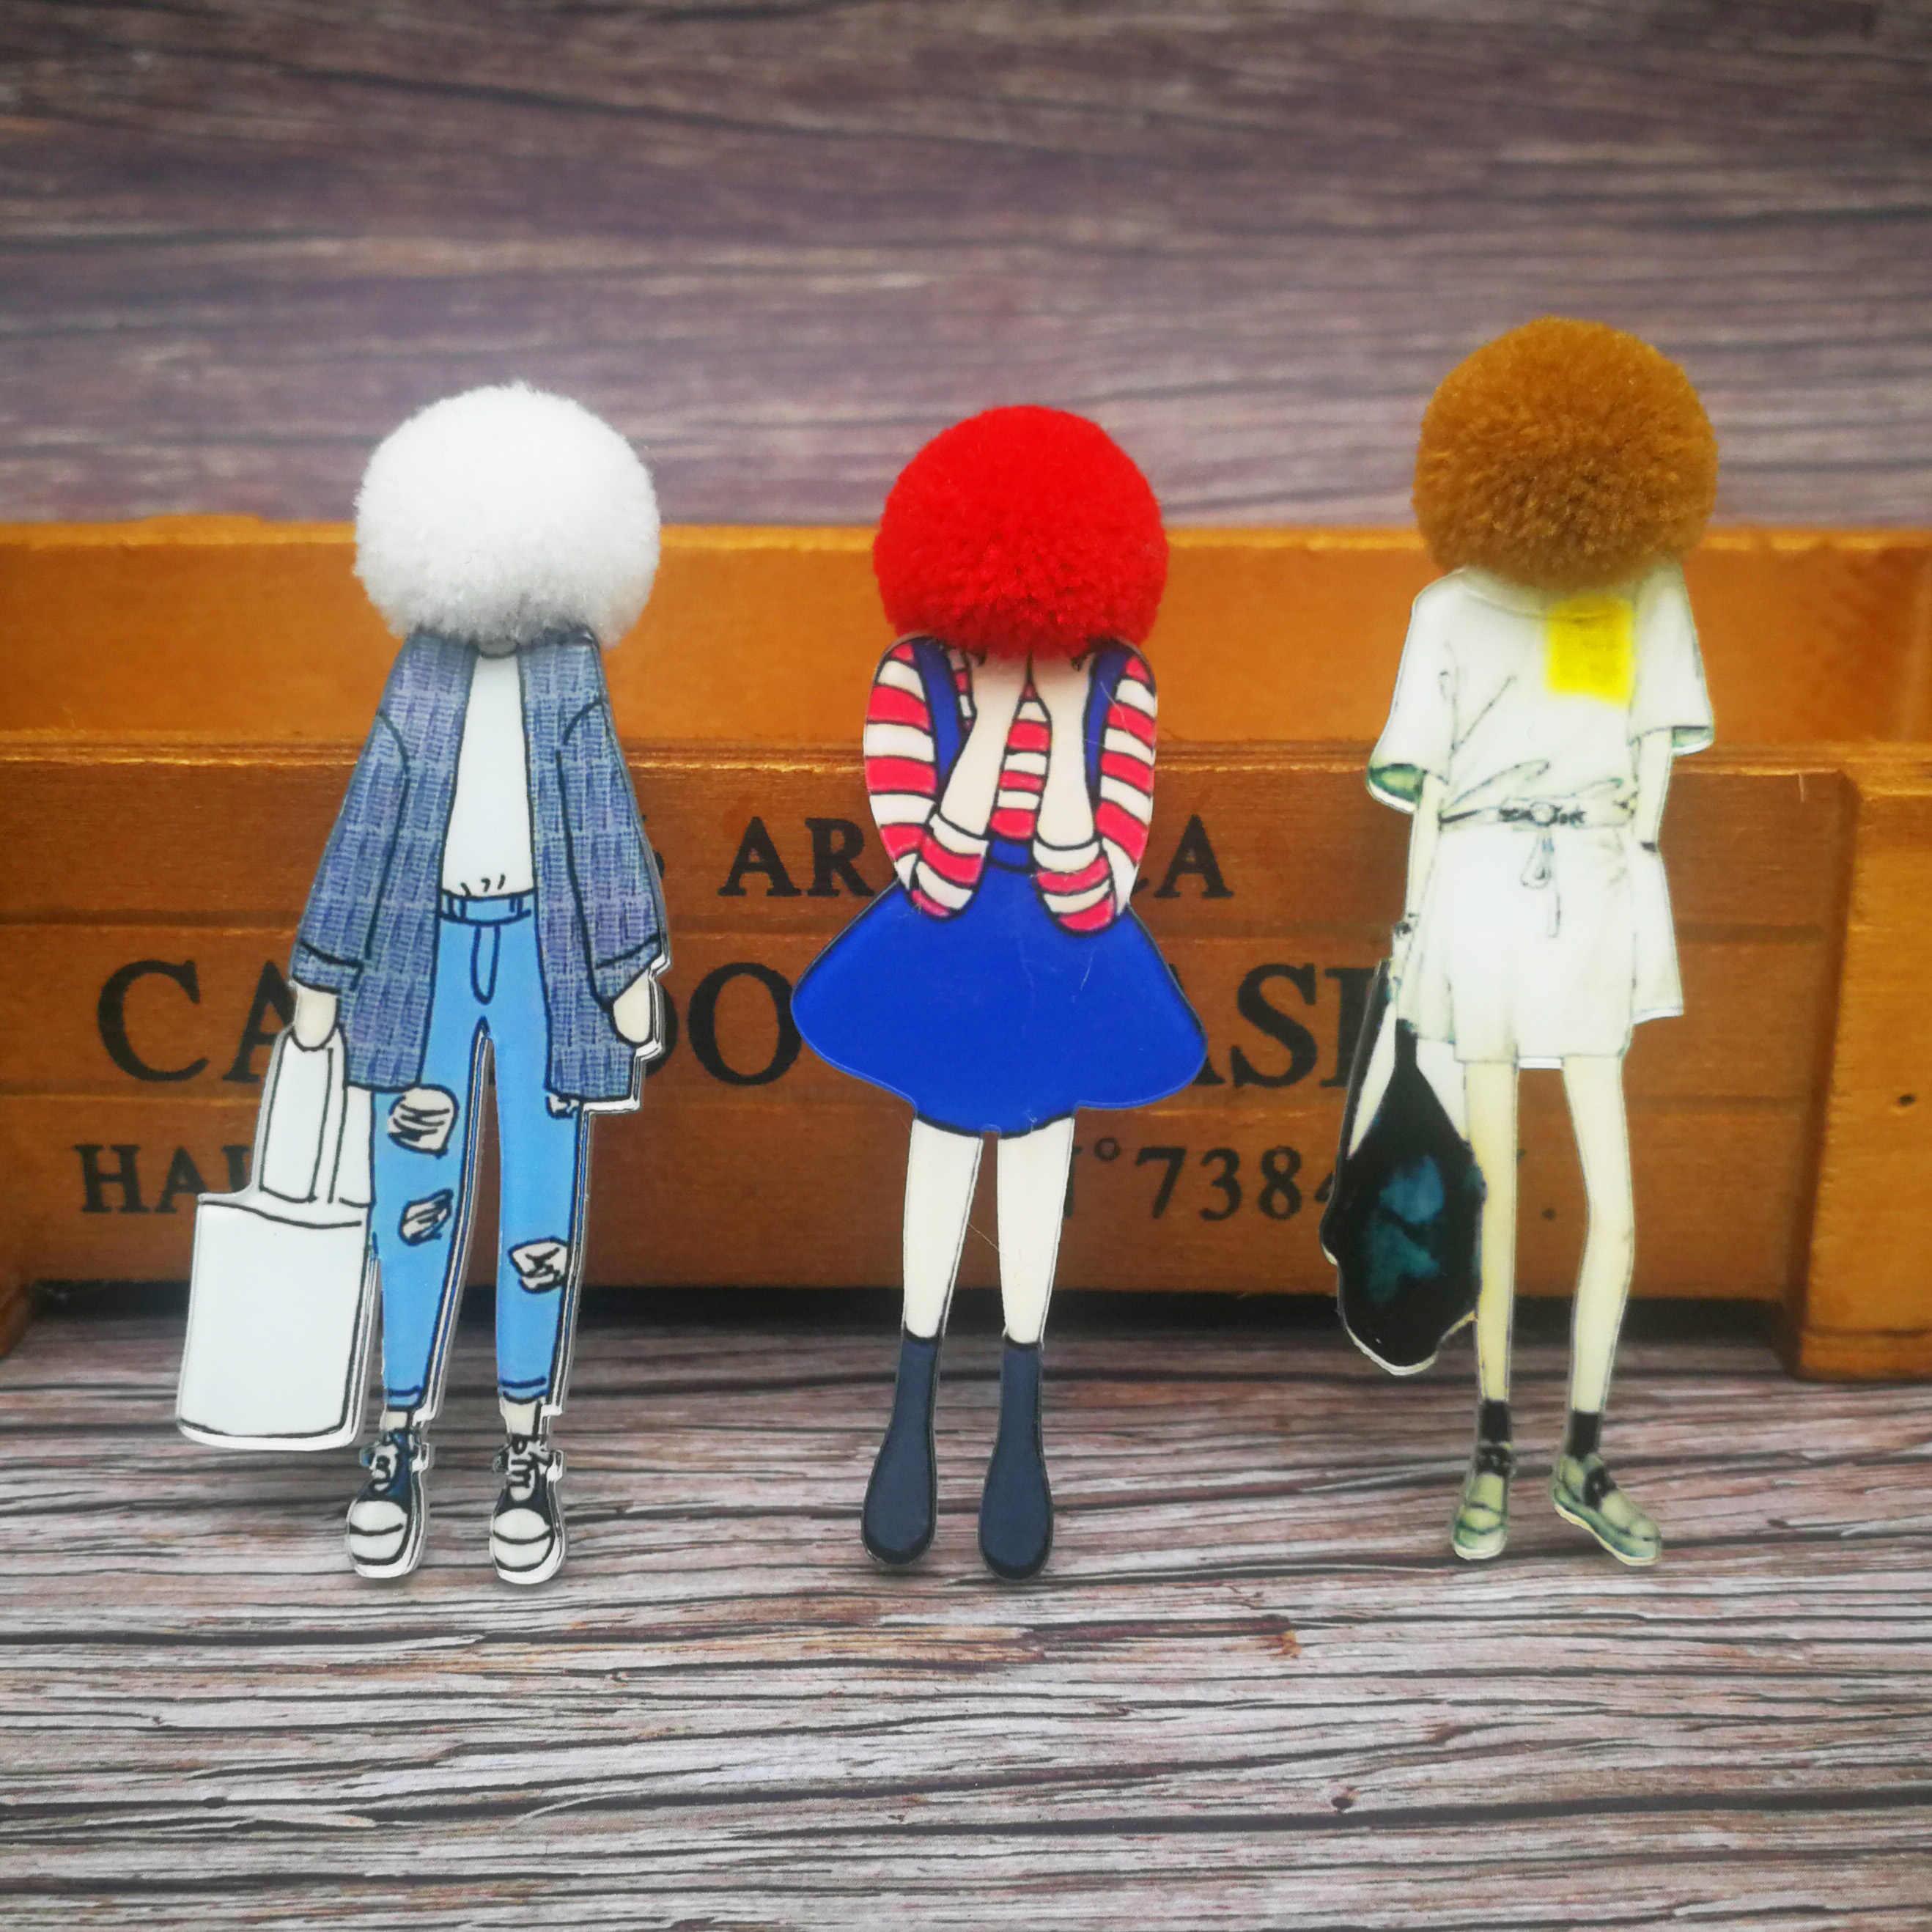 Fashion Bros Pin untuk Wanita Bros Wajah Gadis Kartun Model Akrilik Bros Kawaii Pompom Pakaian Perhiasan Aksesoris